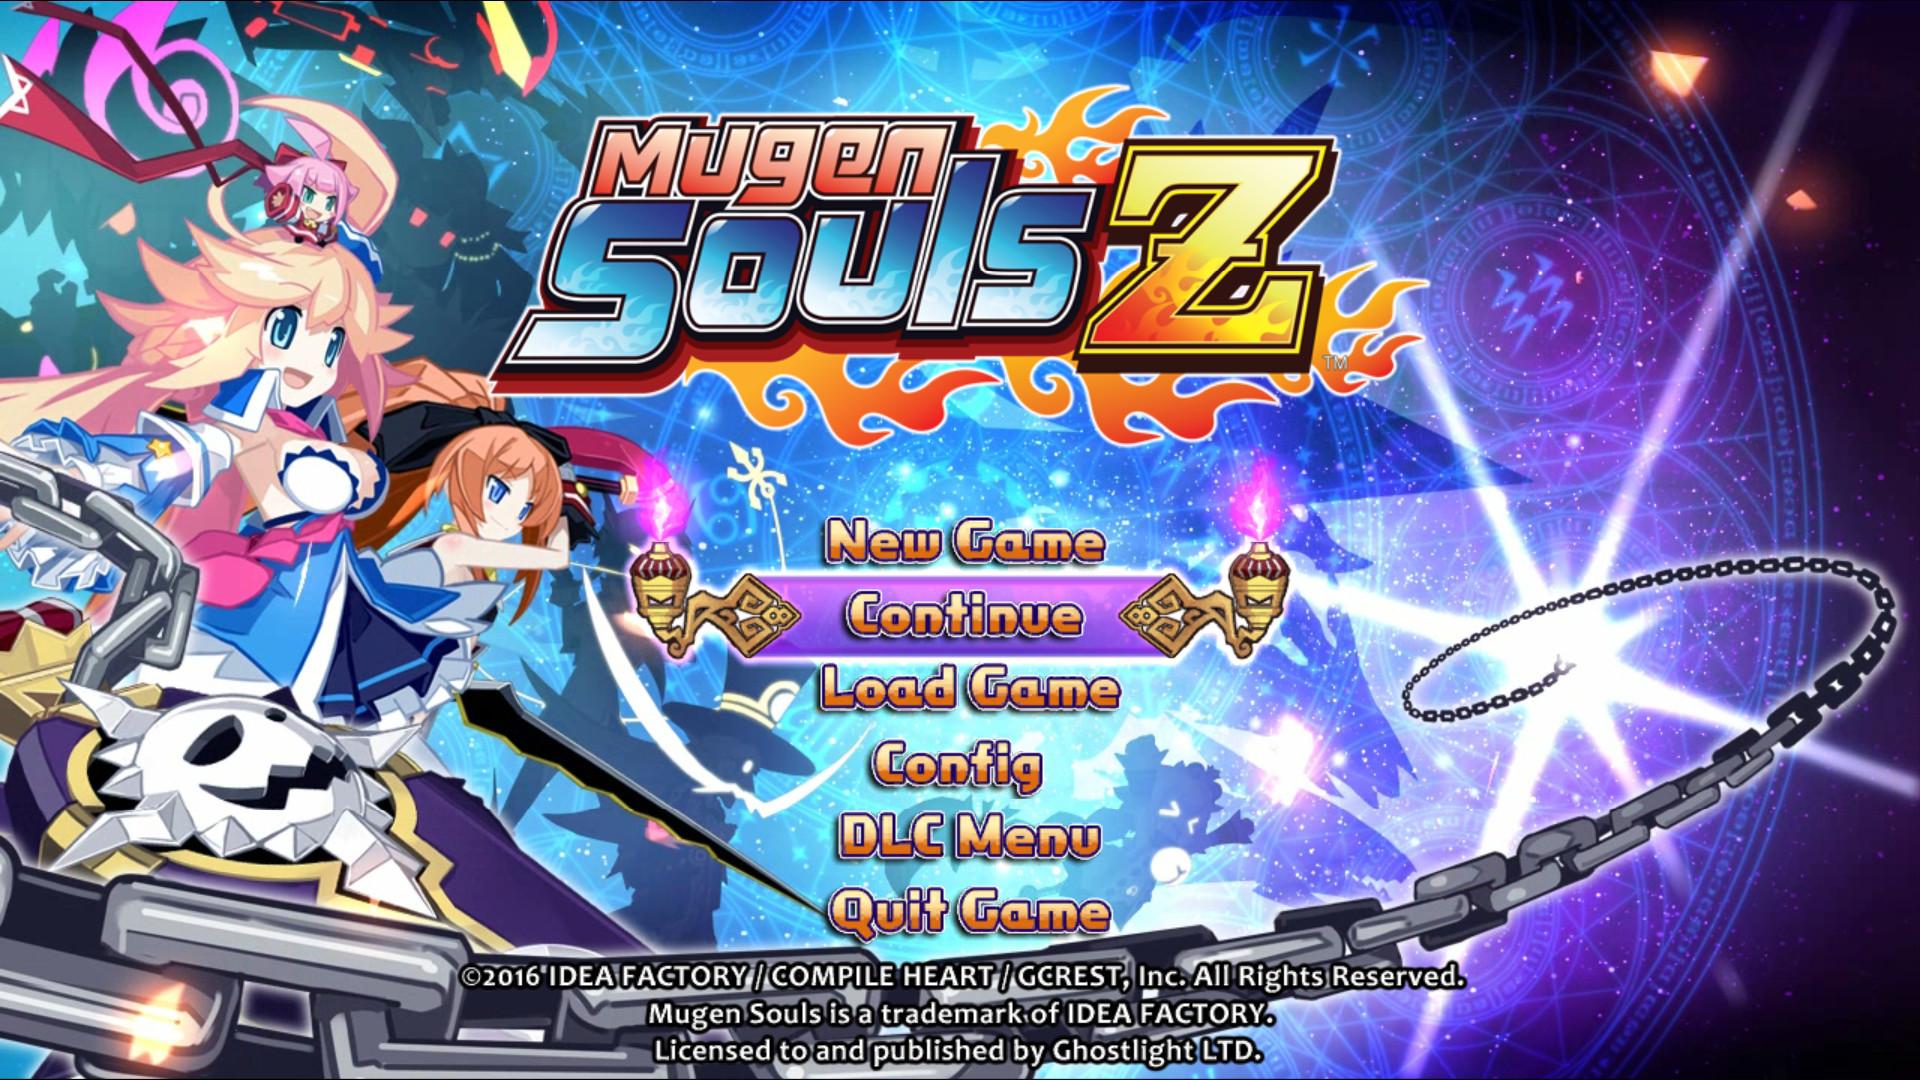 Mugen Souls Z - Overwhelming Ticket Bundle screenshot